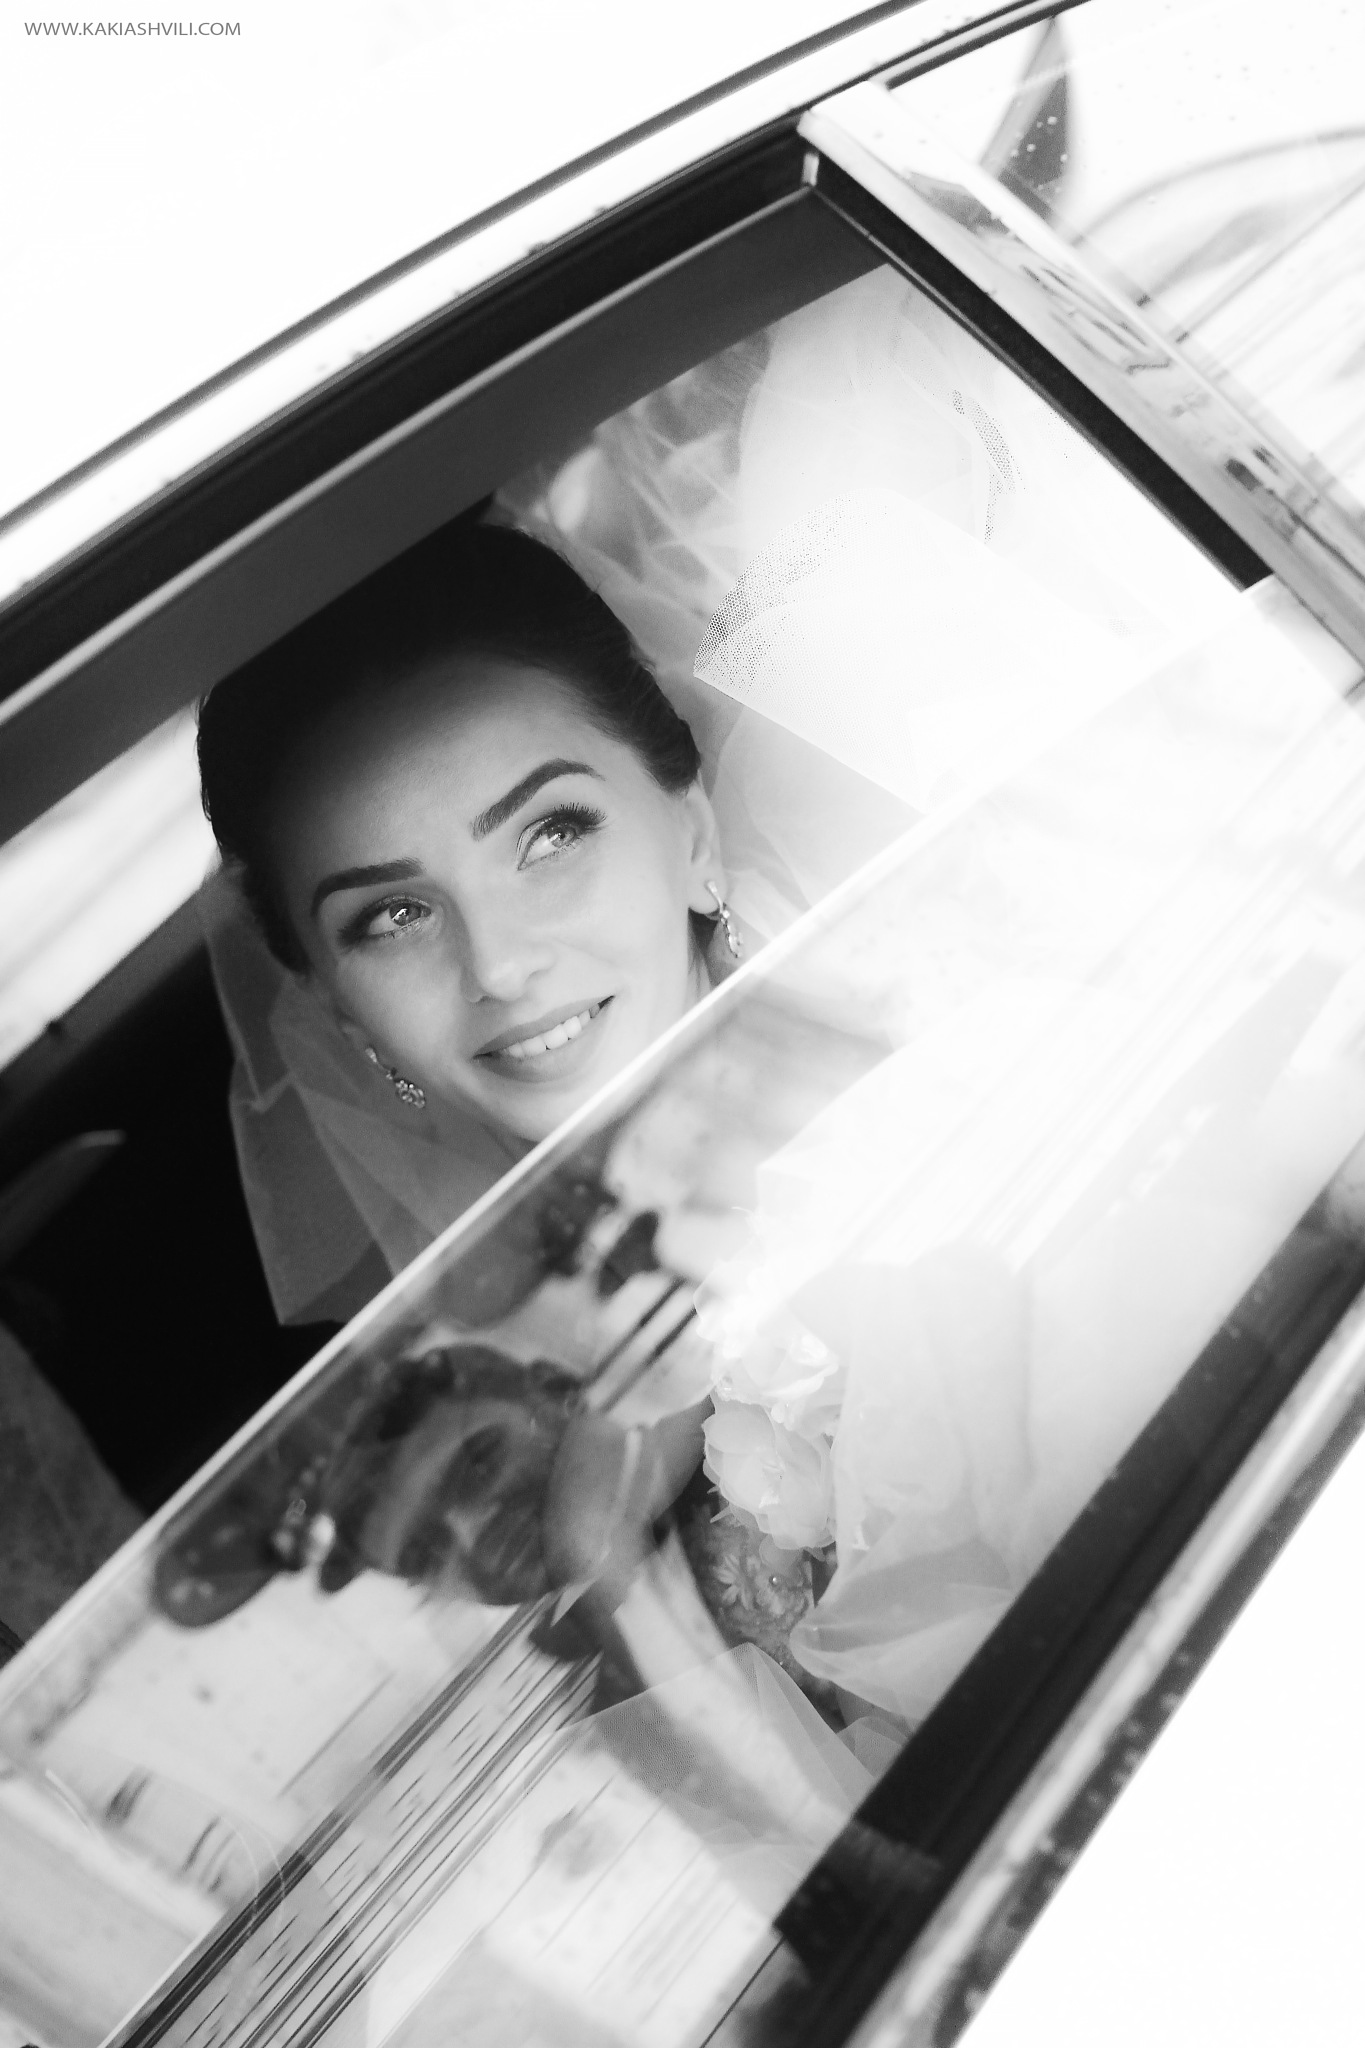 wedding day by George Kakiashvili